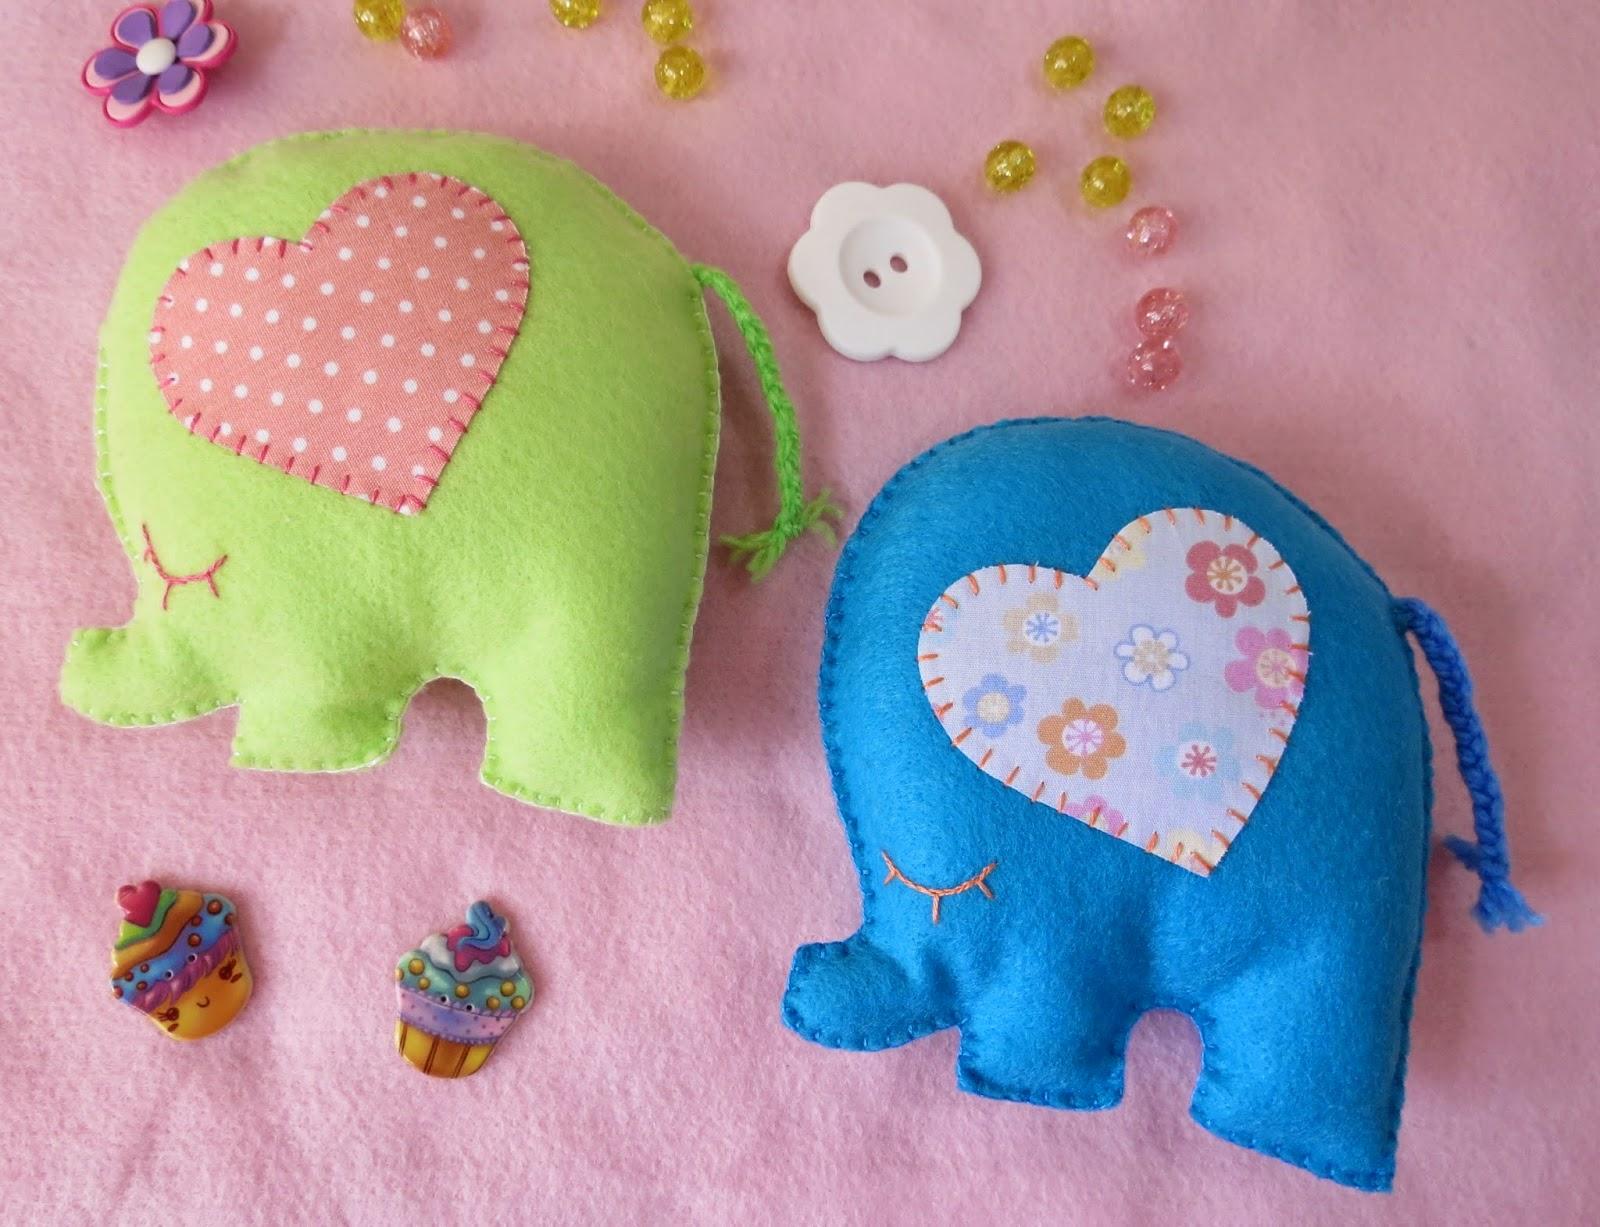 Adesivo Azulejo Pastilha Resinada ~ Arte e Mimos Artesanato em feltro Elefantinho colorido